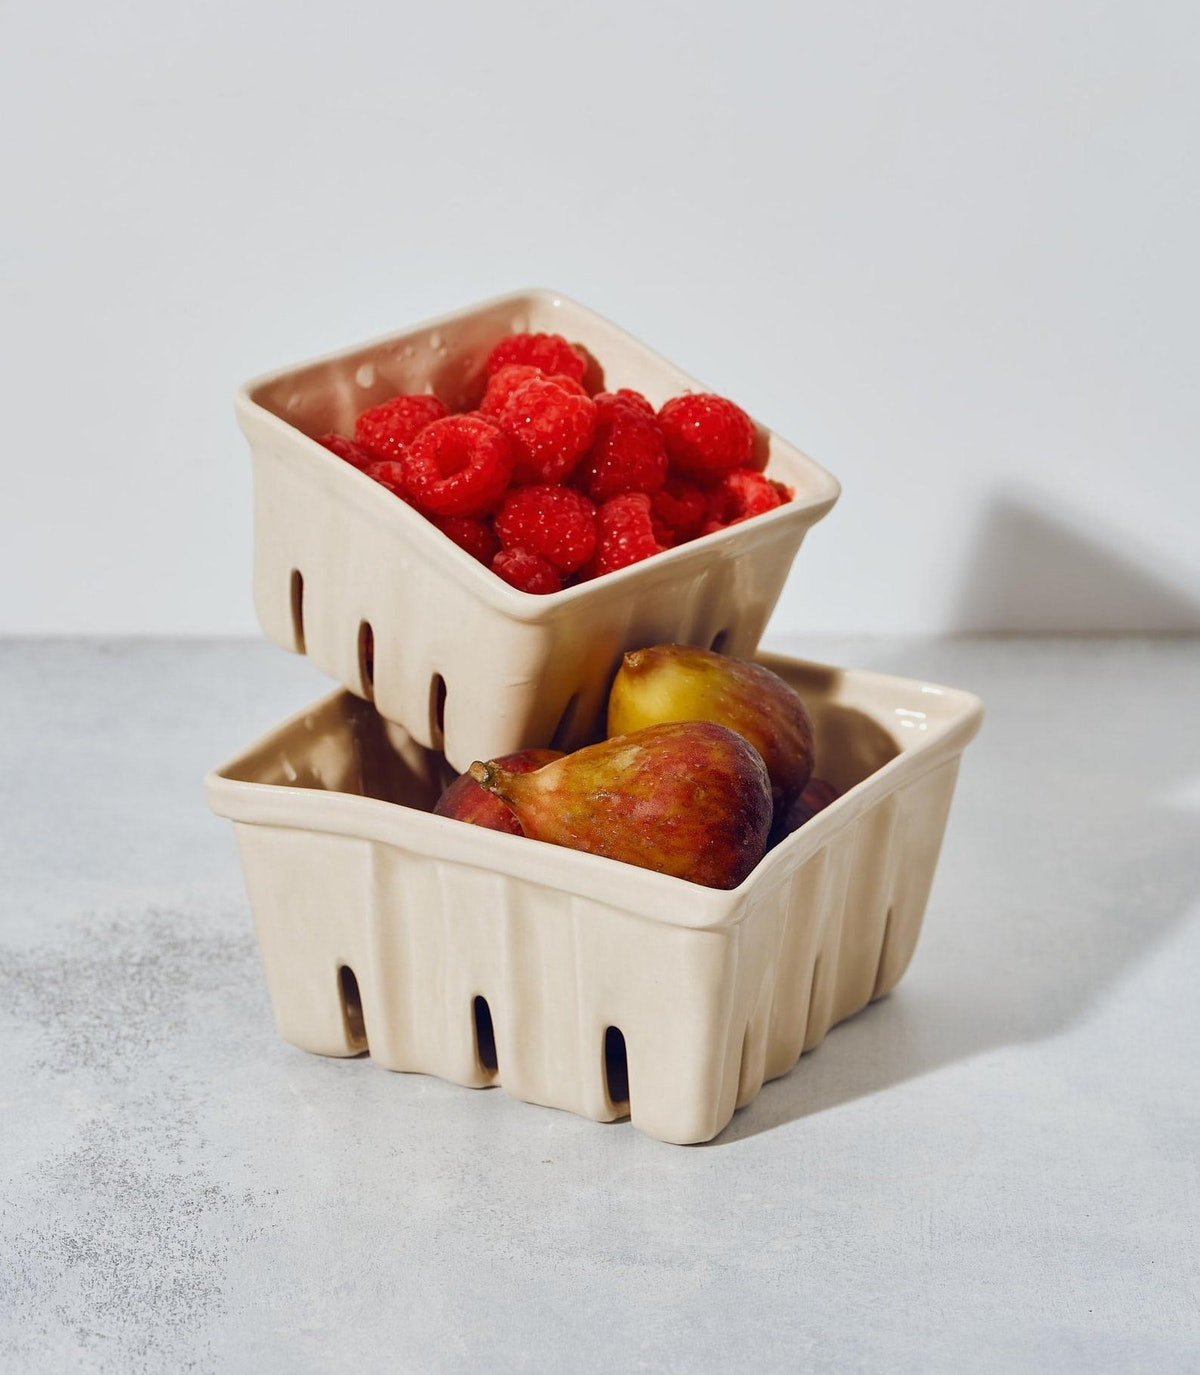 Tia Mowry x Etsy Ceramic Berry Basket